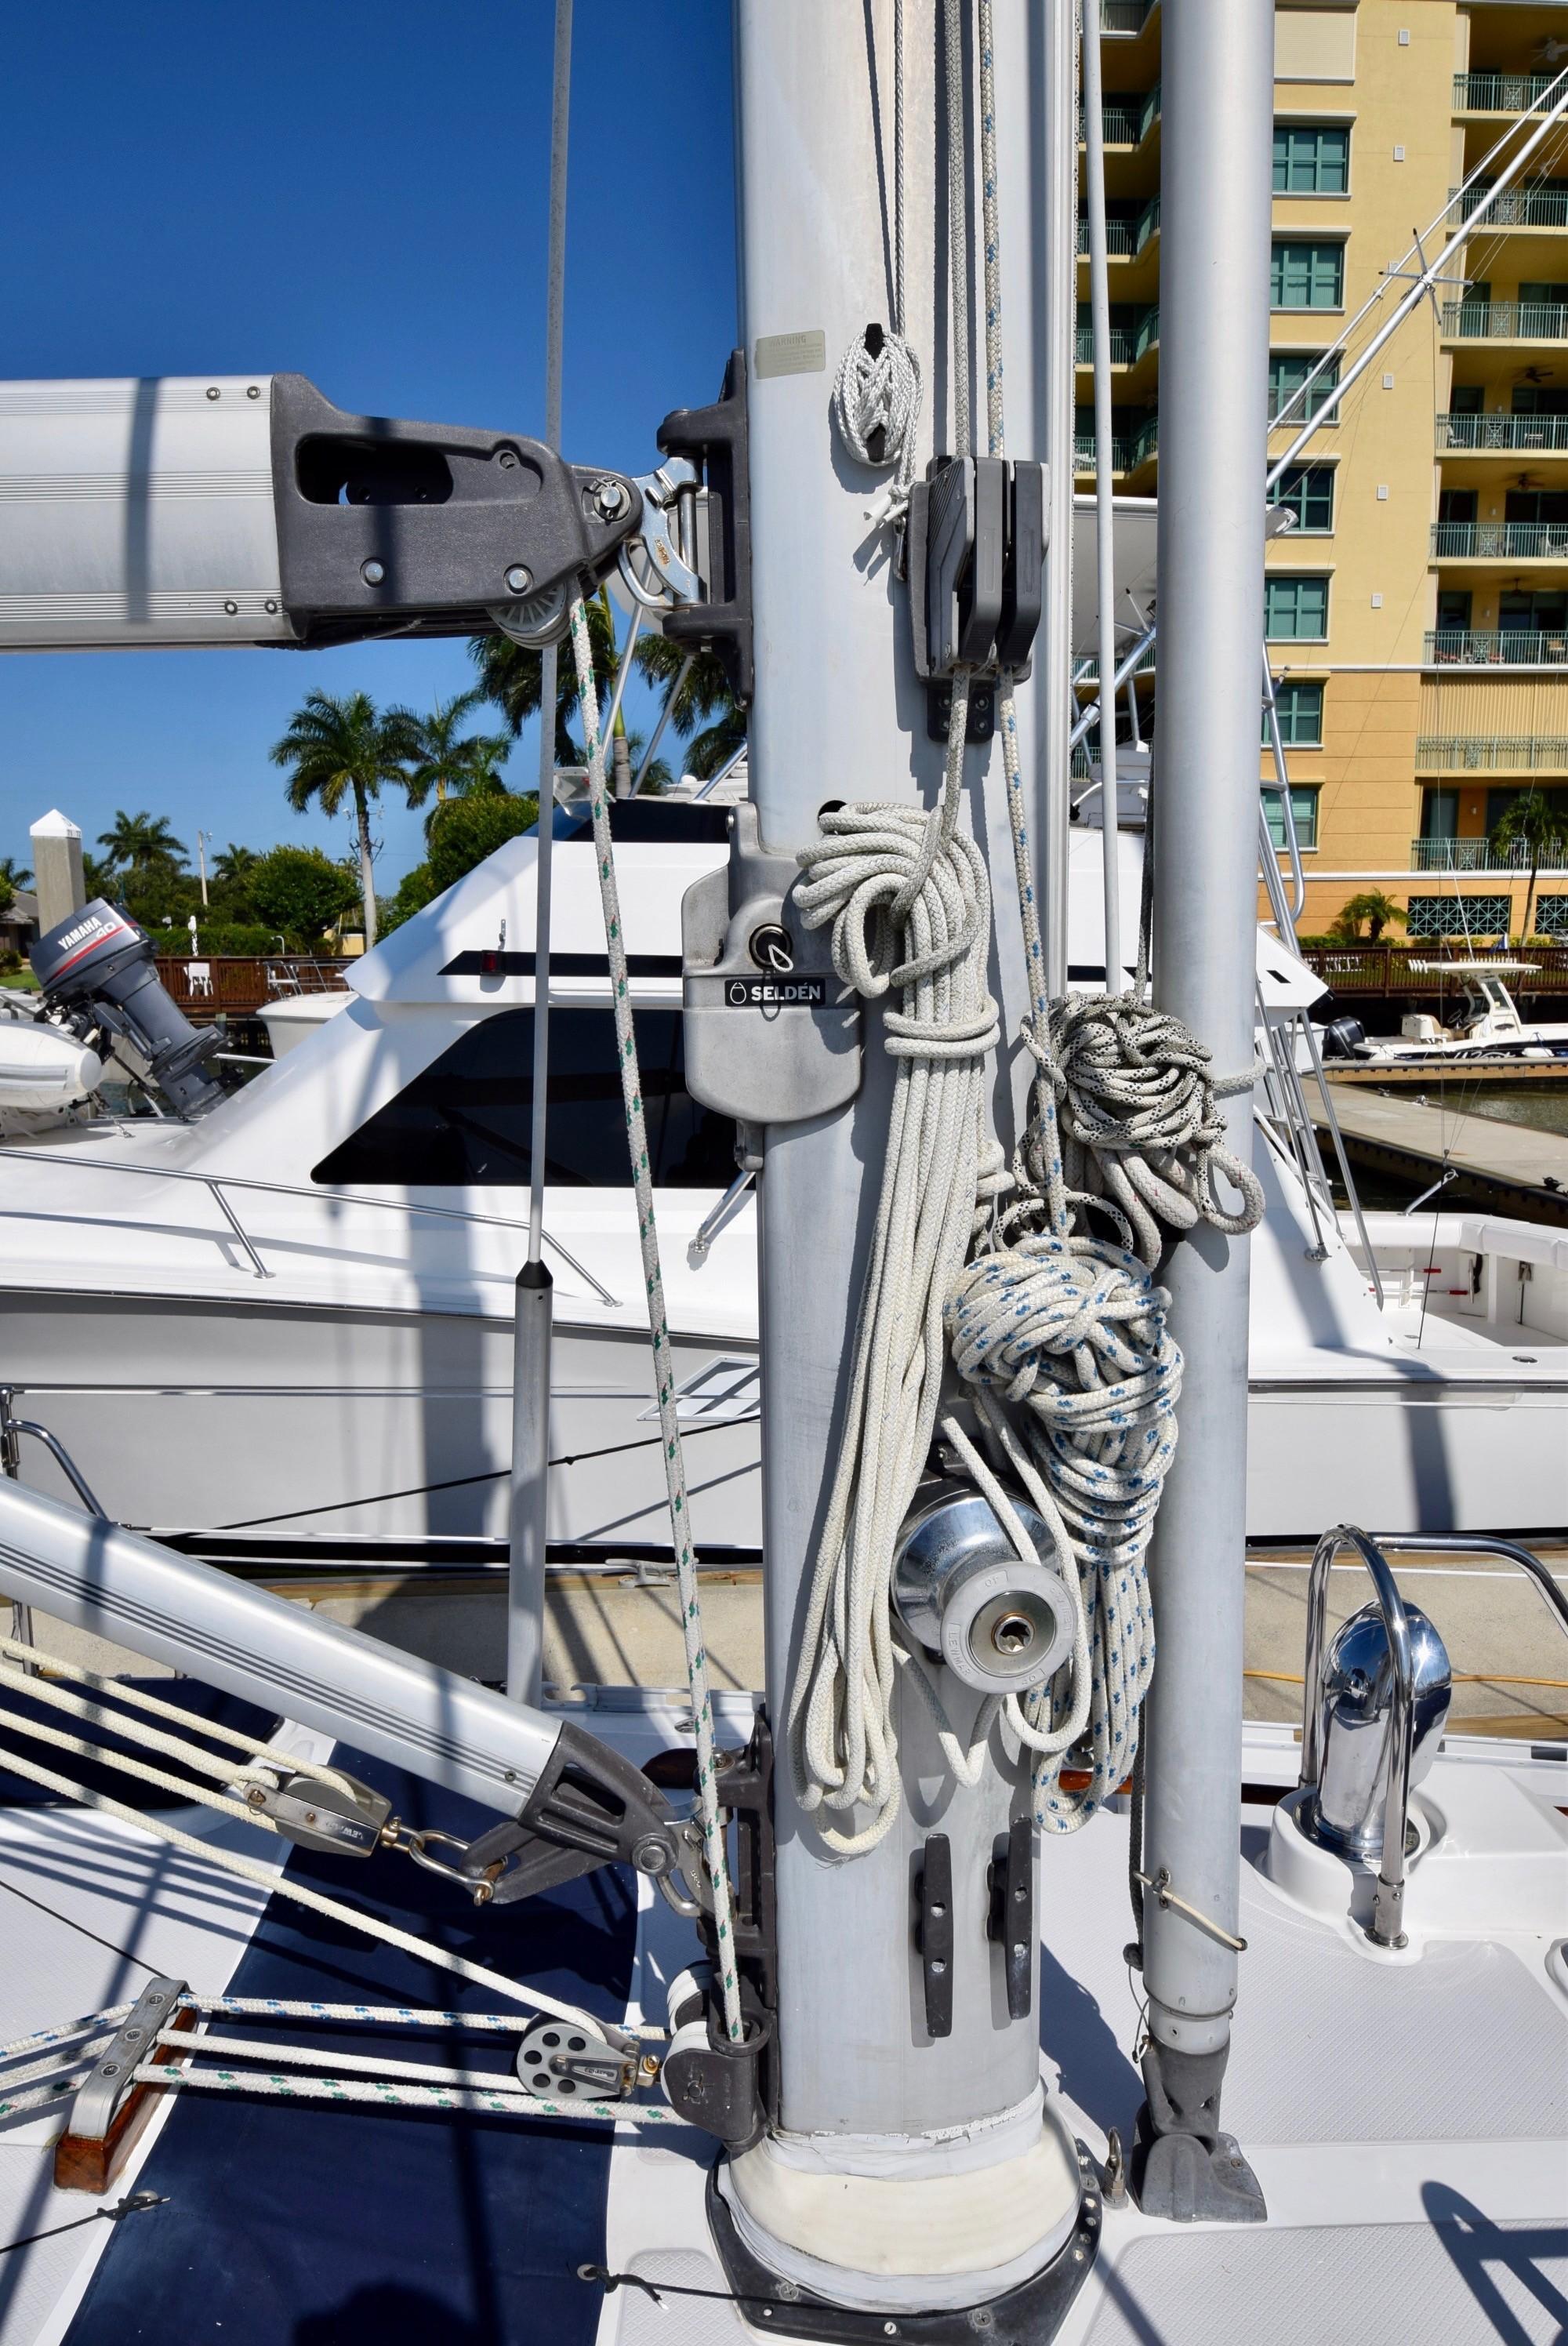 46 Hylas Aeolia 1996 Marco Island | Denison Yacht Sales